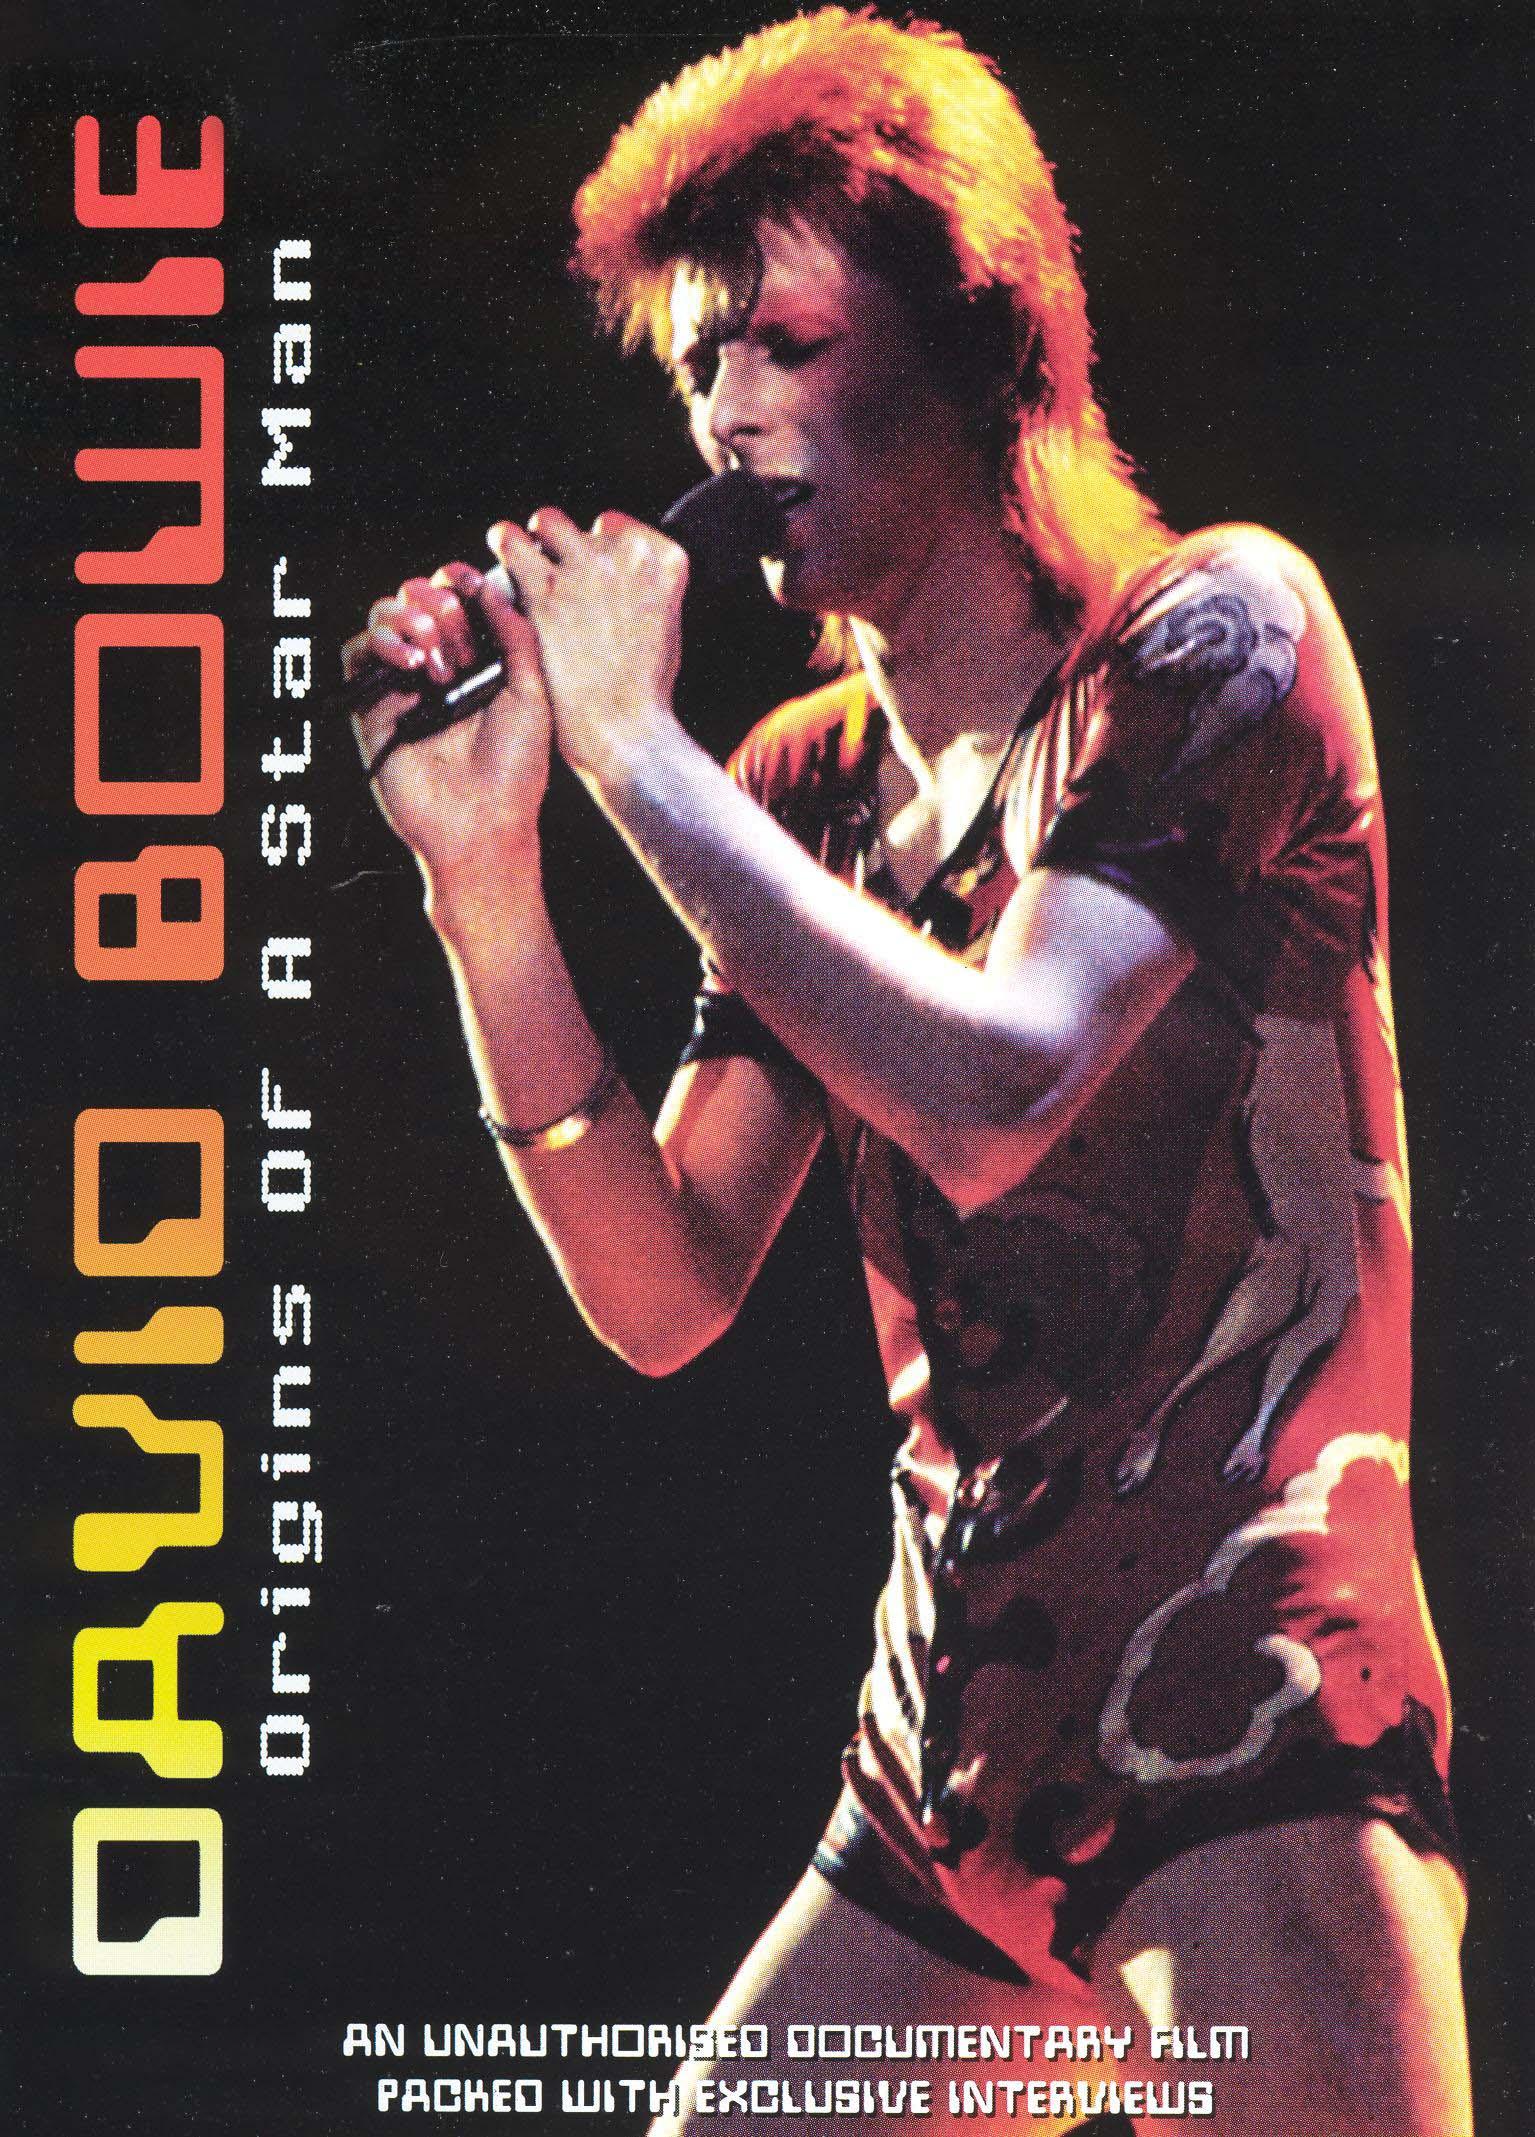 David Bowie: Origins of a Starman